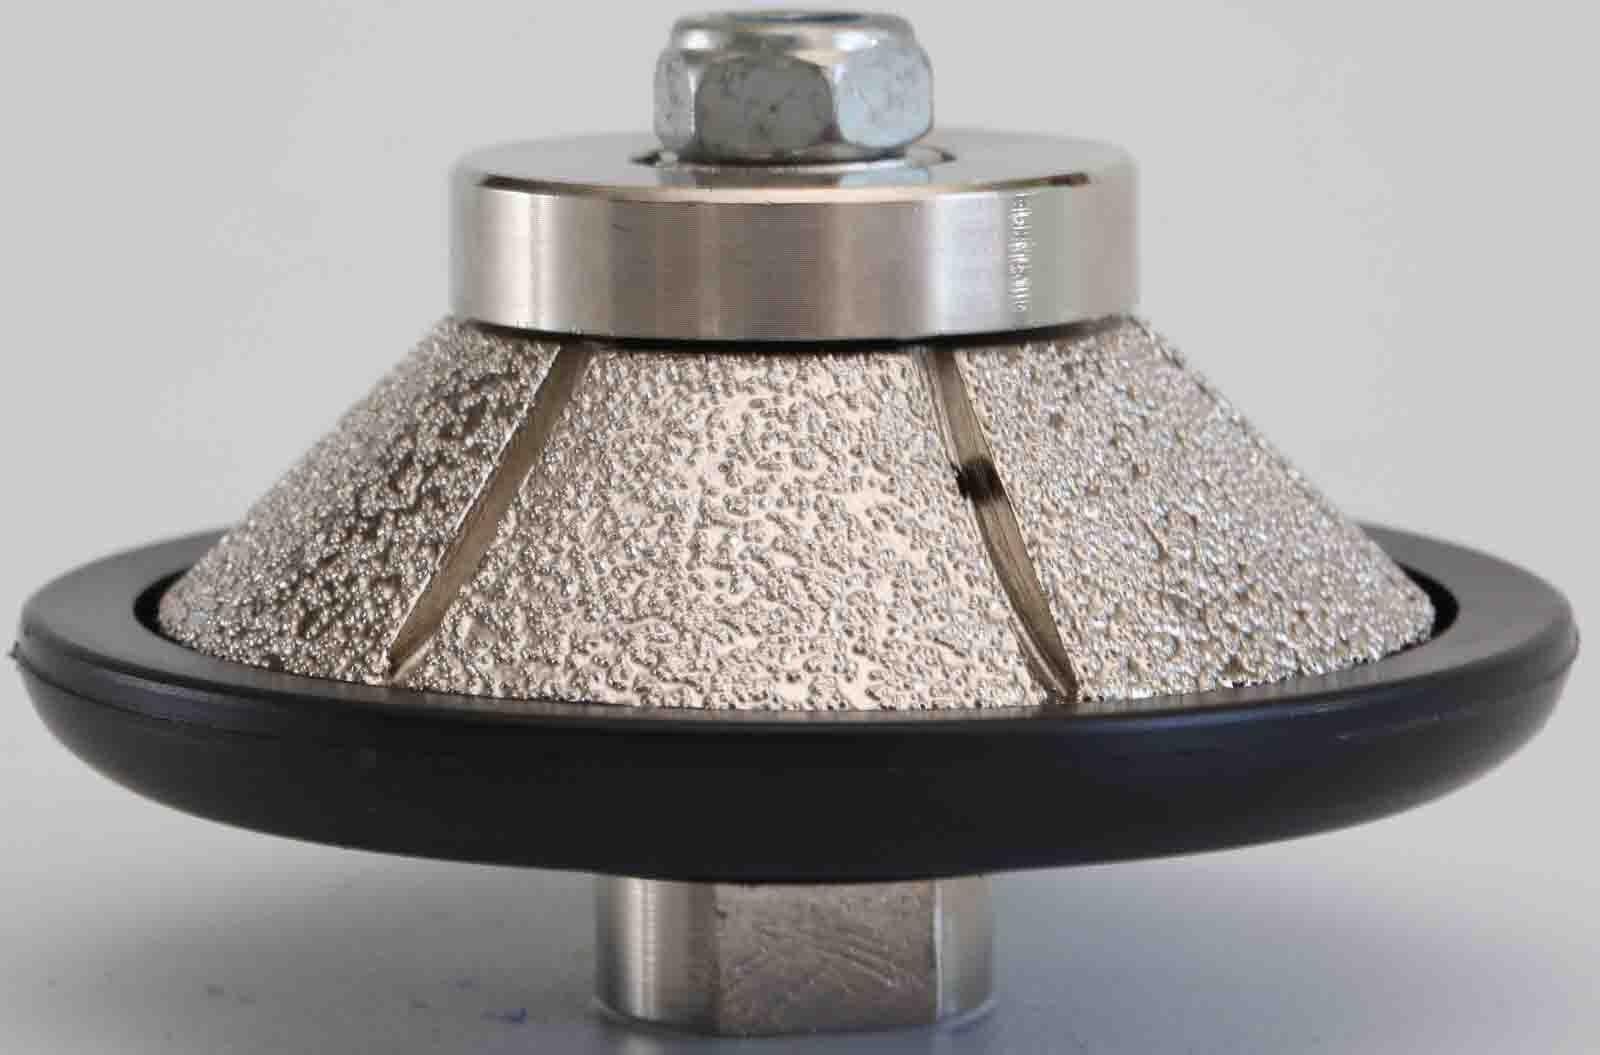 3 8 Inch E-Shape Diamond Hand Profiler Router Bits for Granite 10mm Bevel